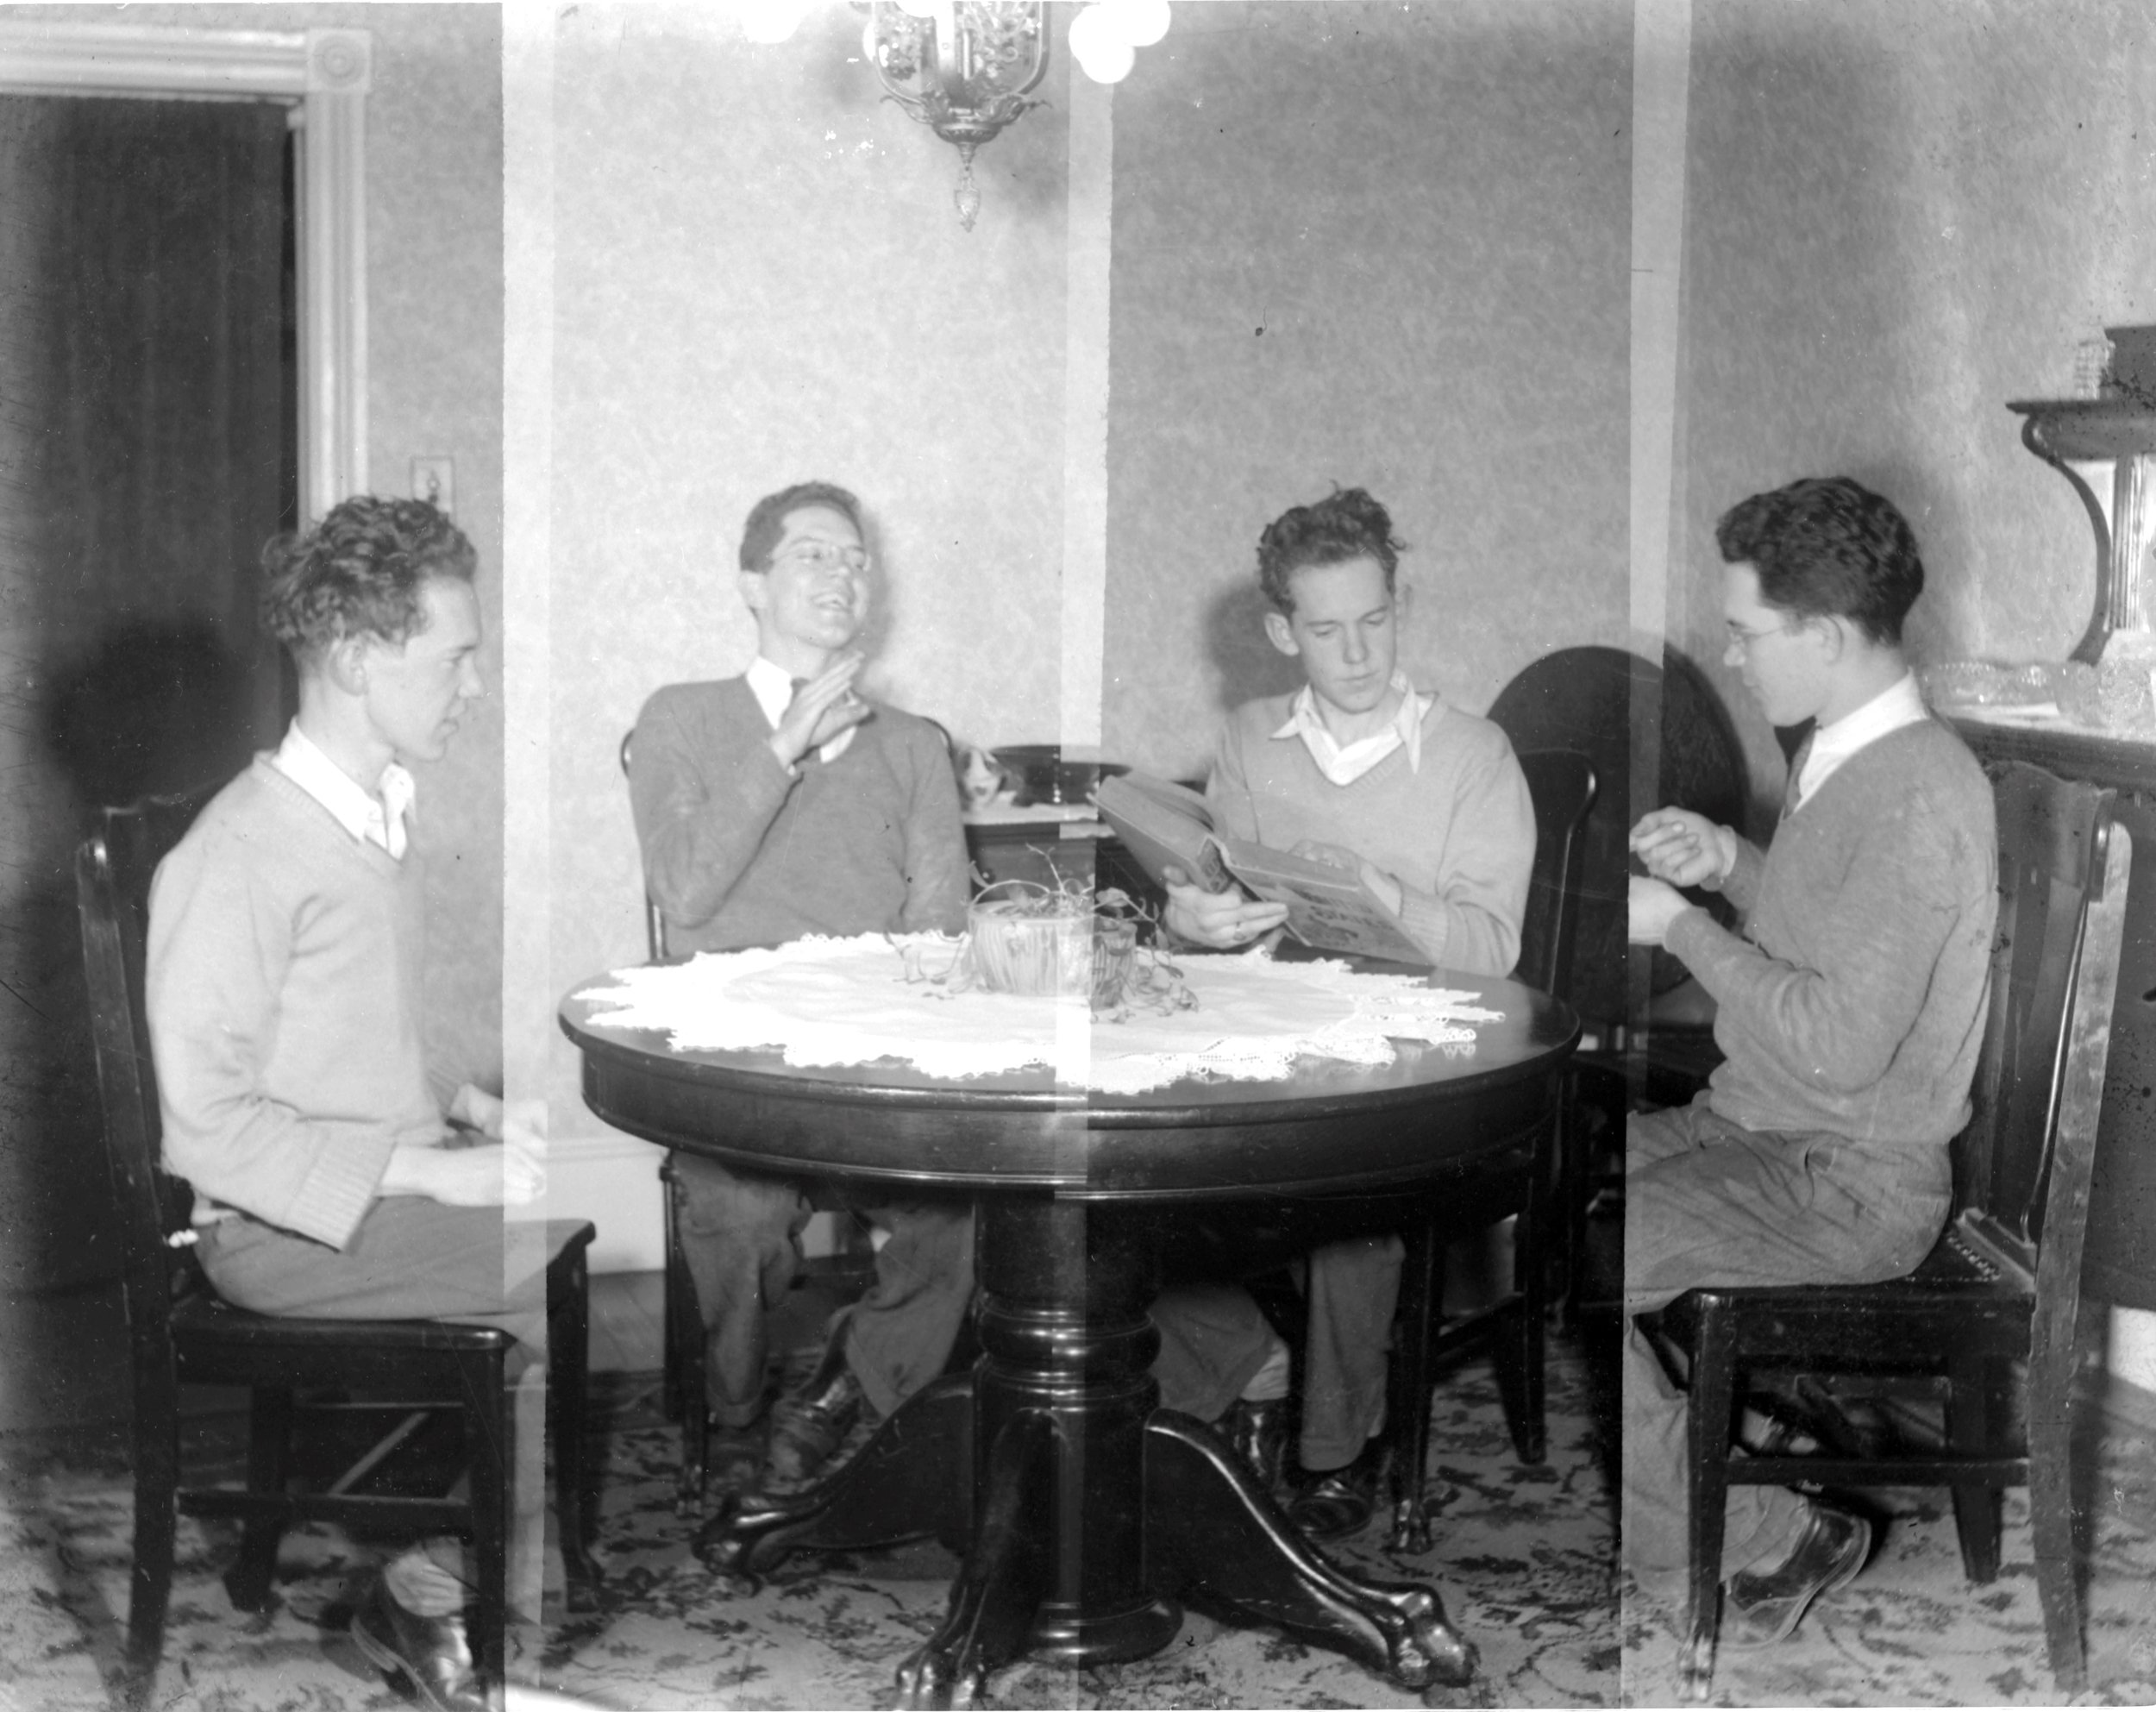 Film still of filmmaker, Arthur H. Virtue's 'trick shots', circa late 1930s.  (image courtesy of Virginia Errichetti)